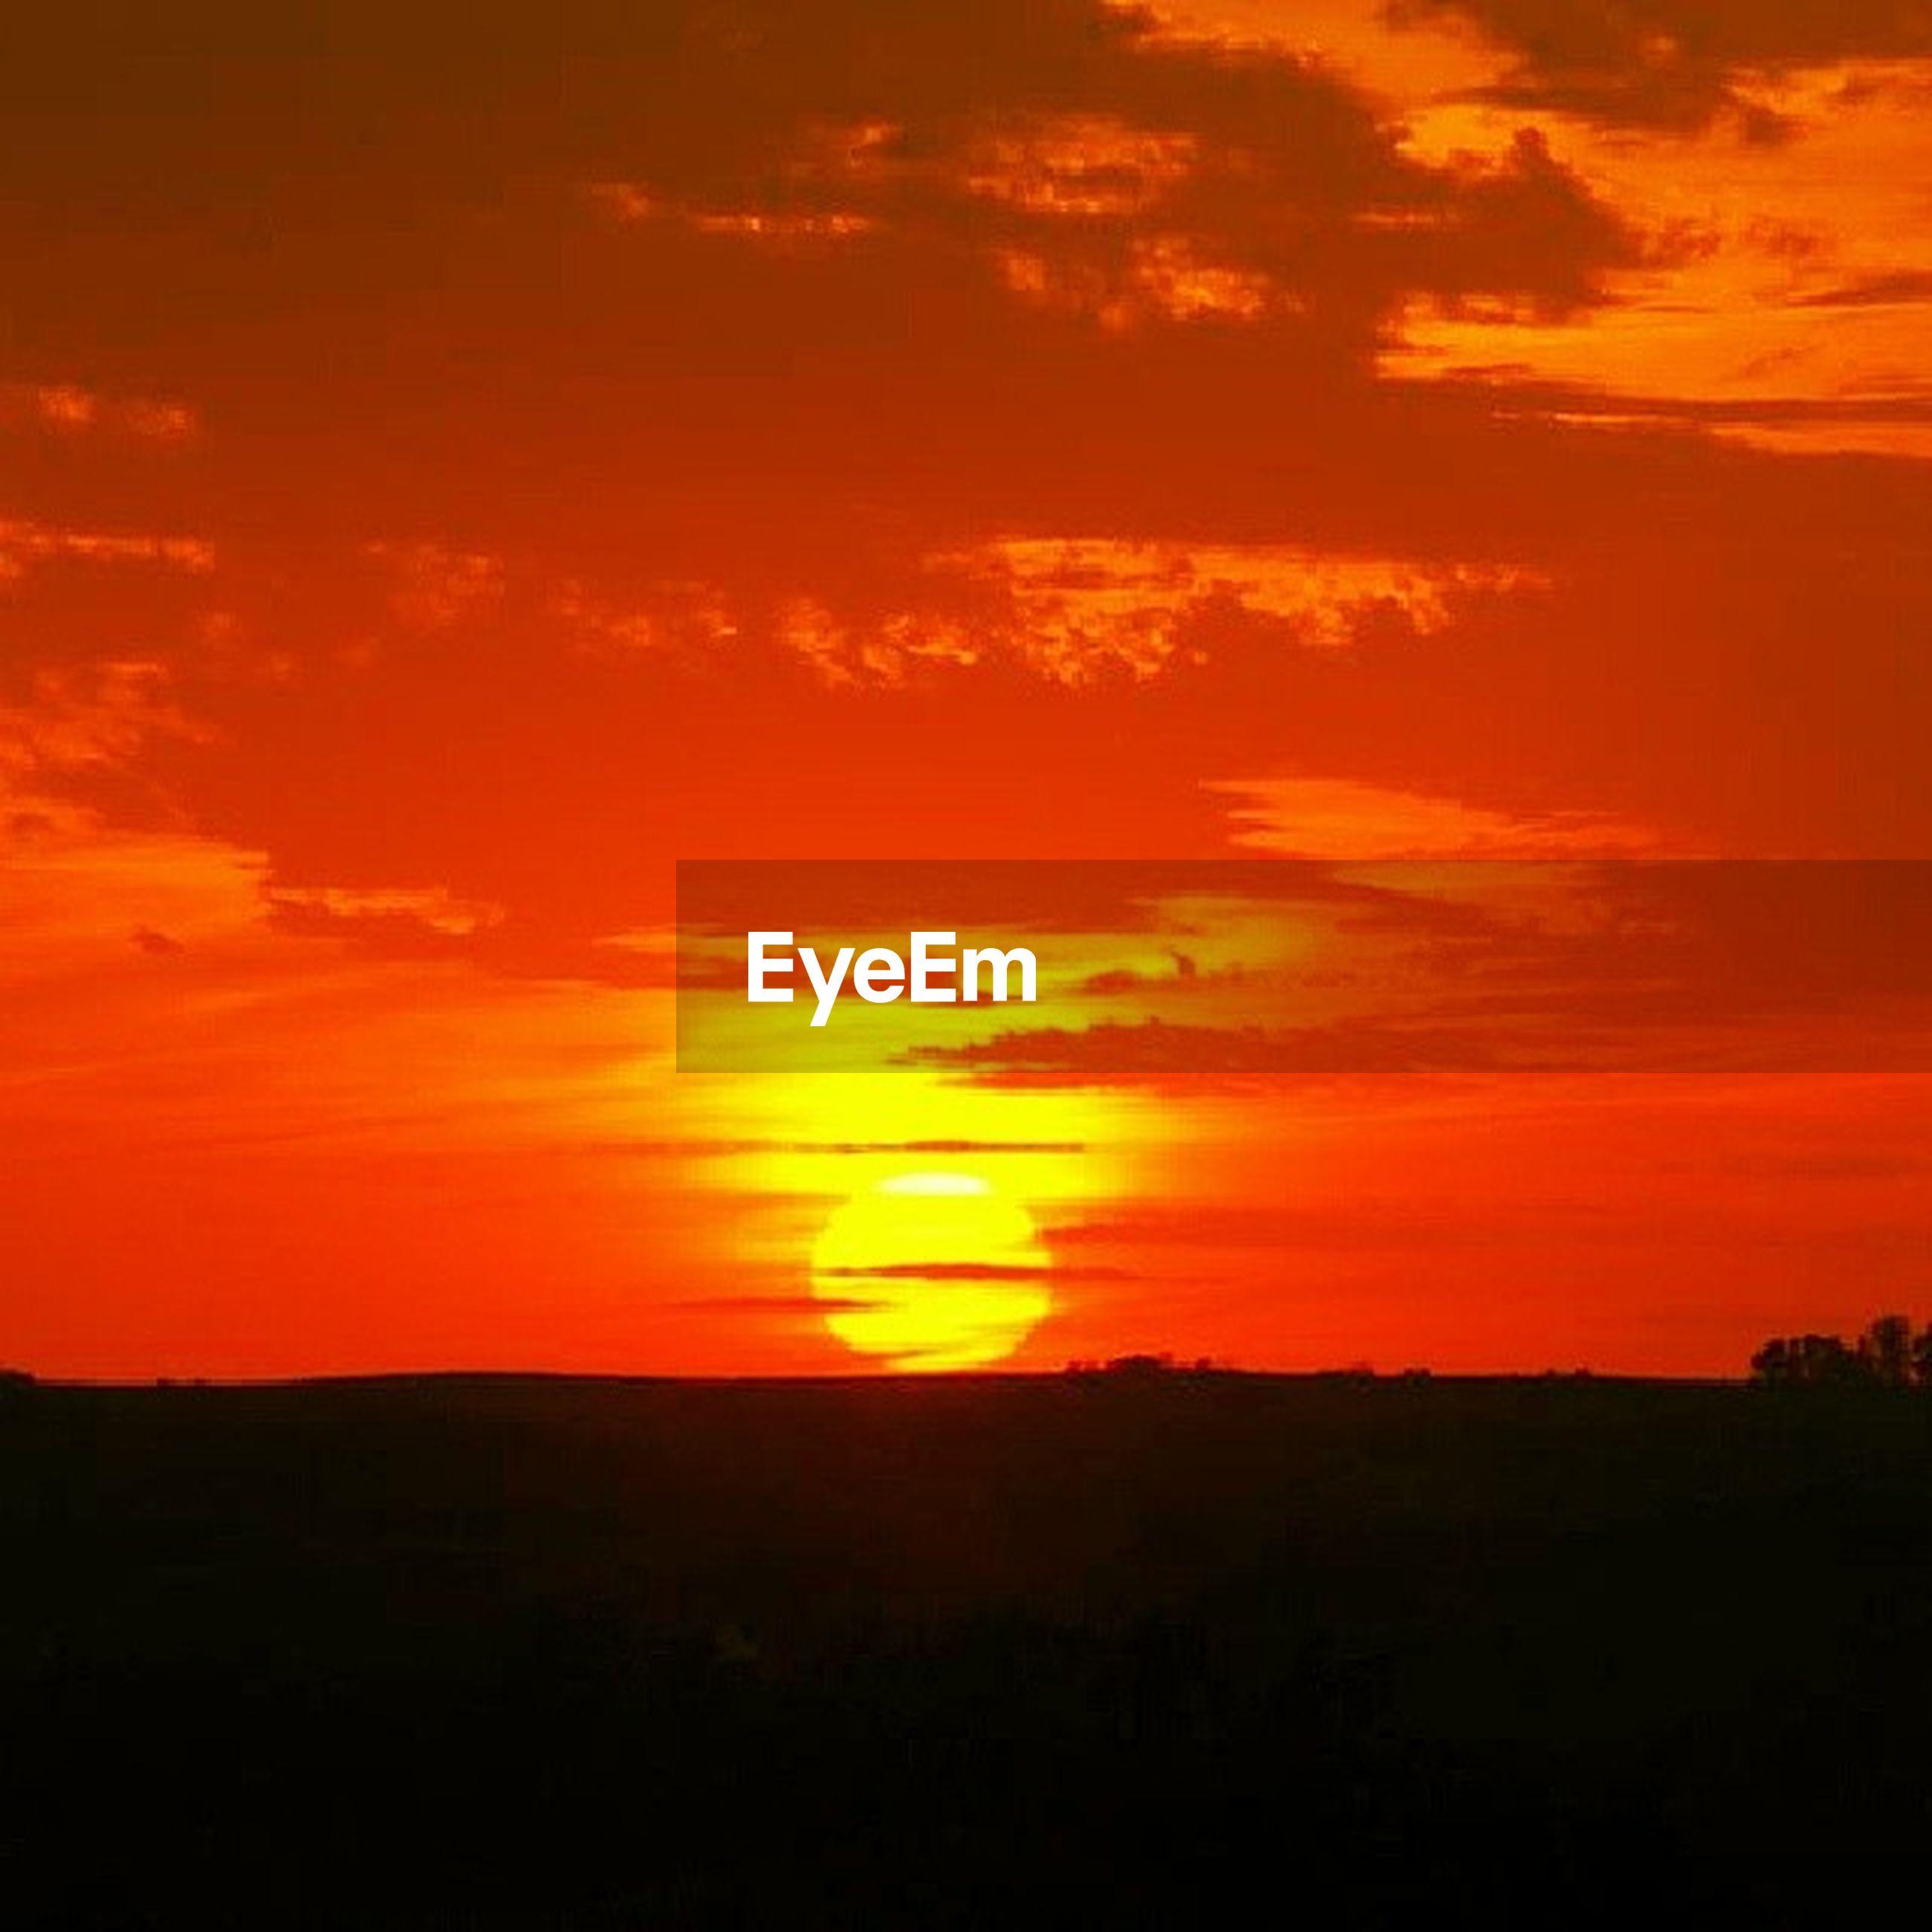 sunset, orange color, scenics, silhouette, tranquil scene, beauty in nature, tranquility, sky, idyllic, sun, nature, landscape, dramatic sky, cloud - sky, mountain, majestic, cloud, outdoors, sunlight, non-urban scene